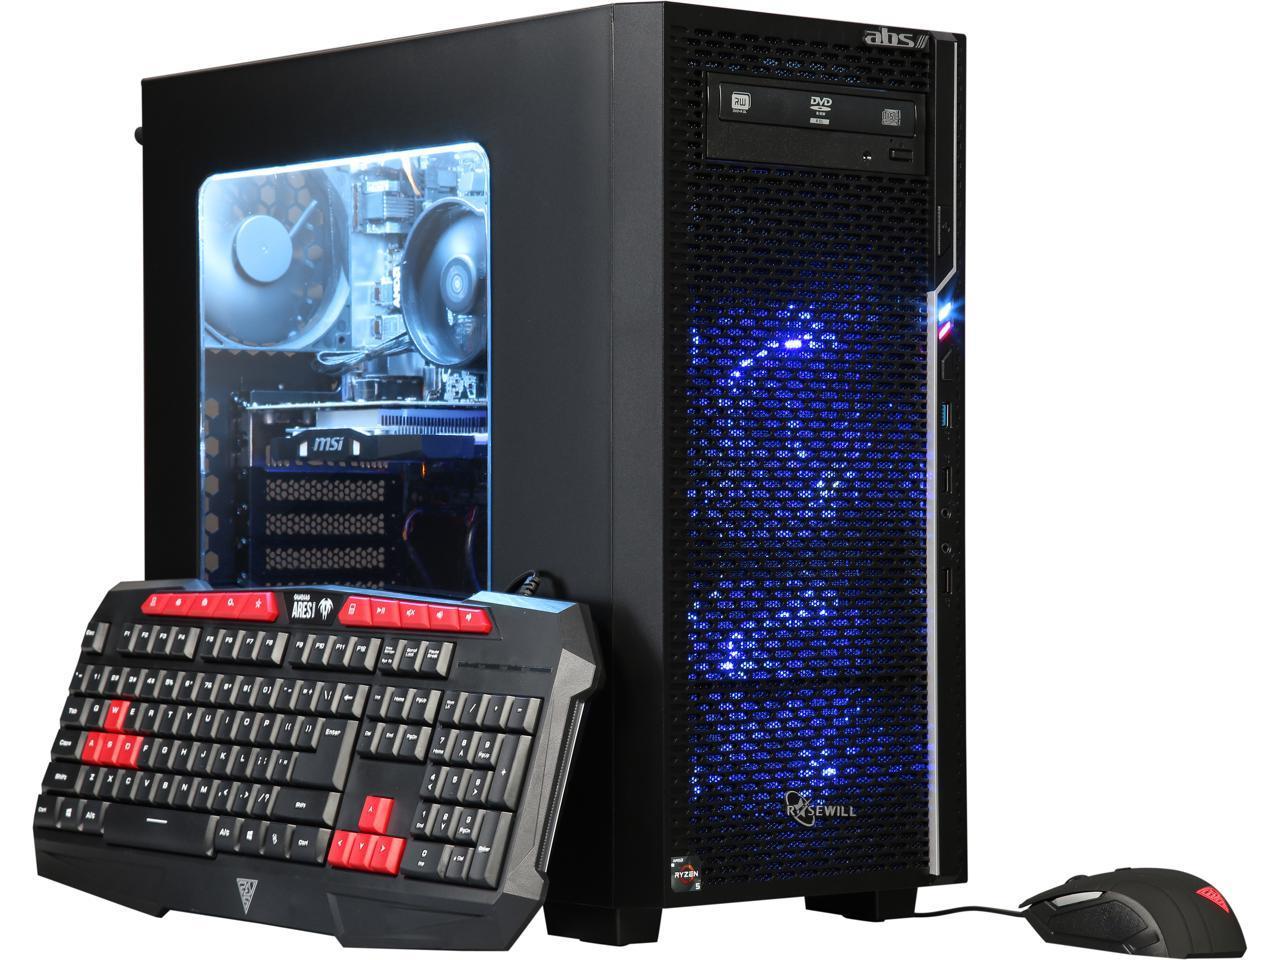 ABS Prime-1400 AMD Quad Core Ryzen 5 1400 Gaming Desktop